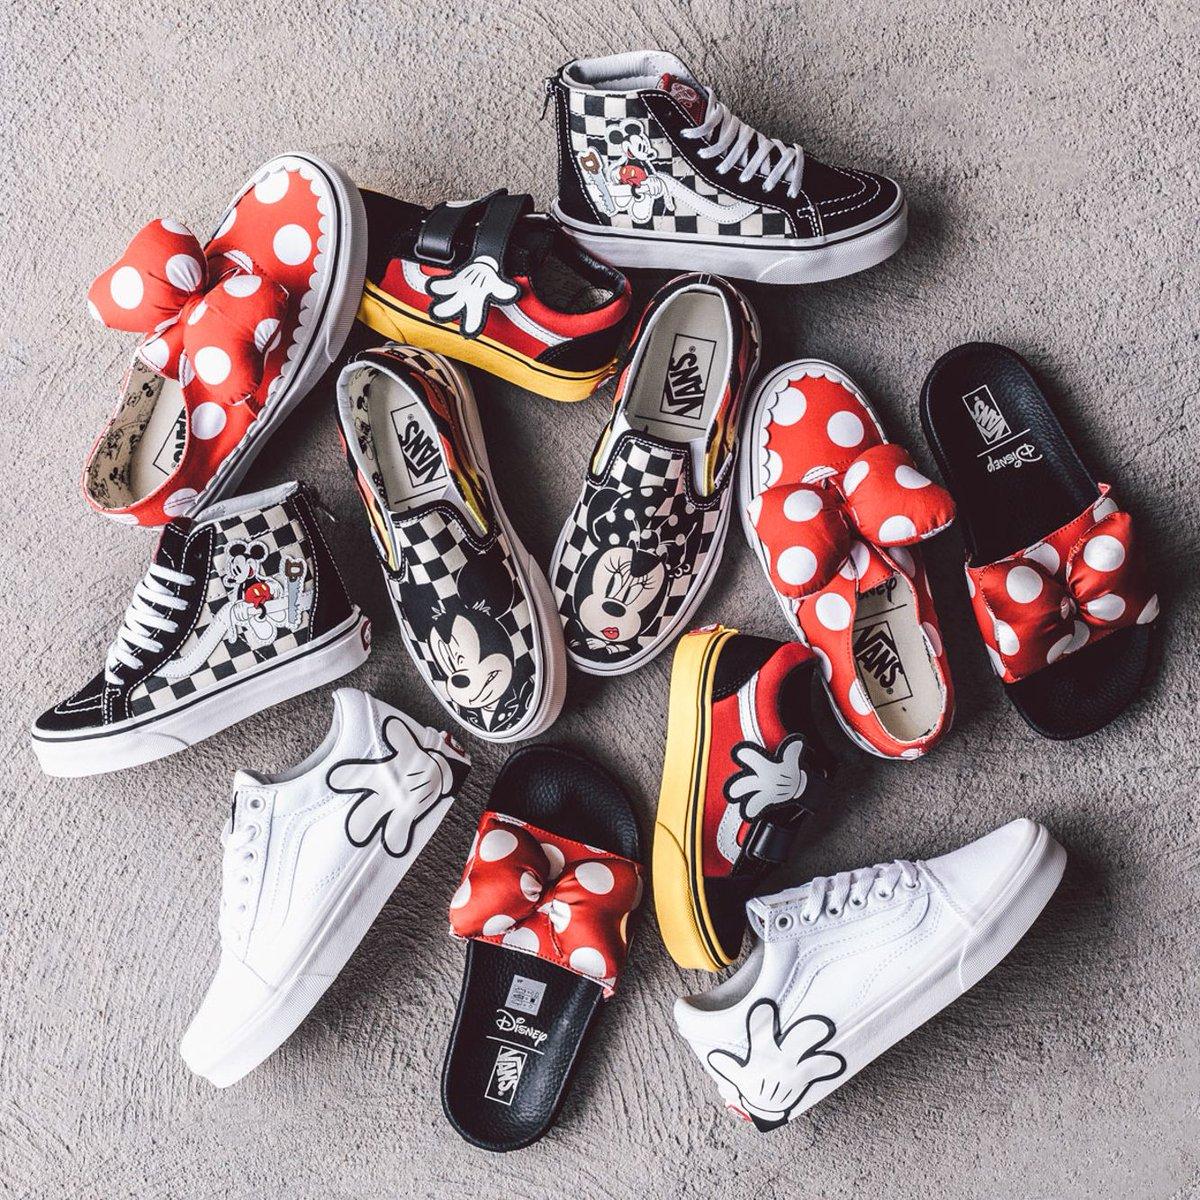 c8daa546c3 On Sale  Disney x Vans Mickey Mouse